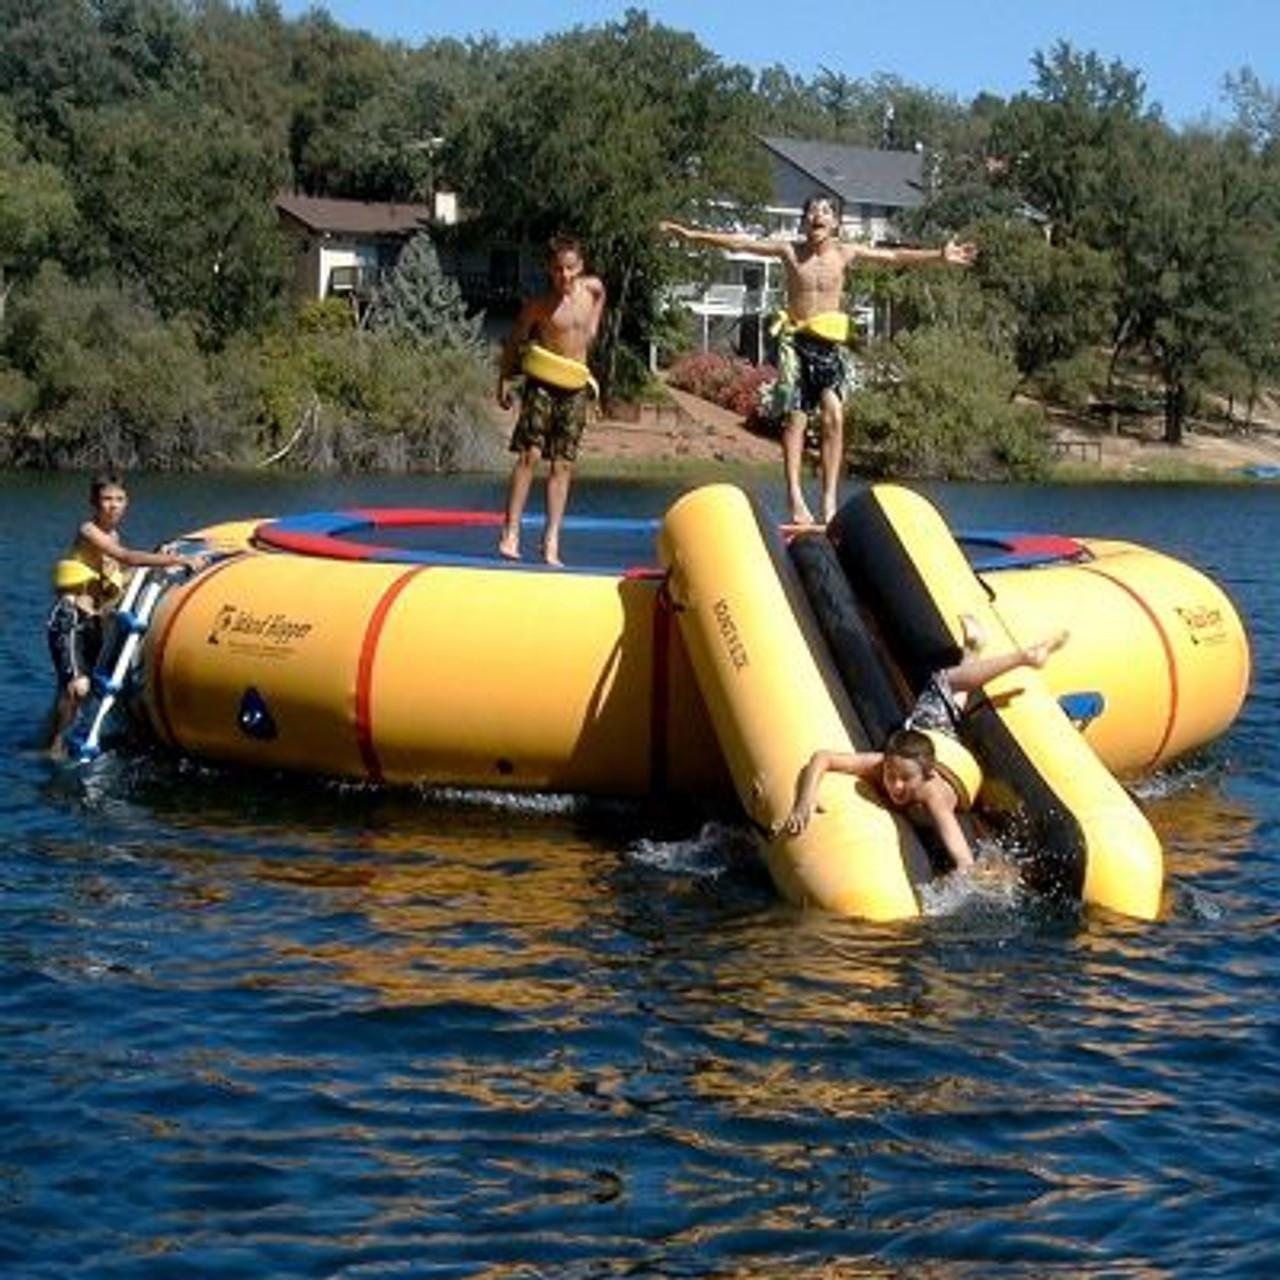 The Island Hopper Bounce N Slide Attachment